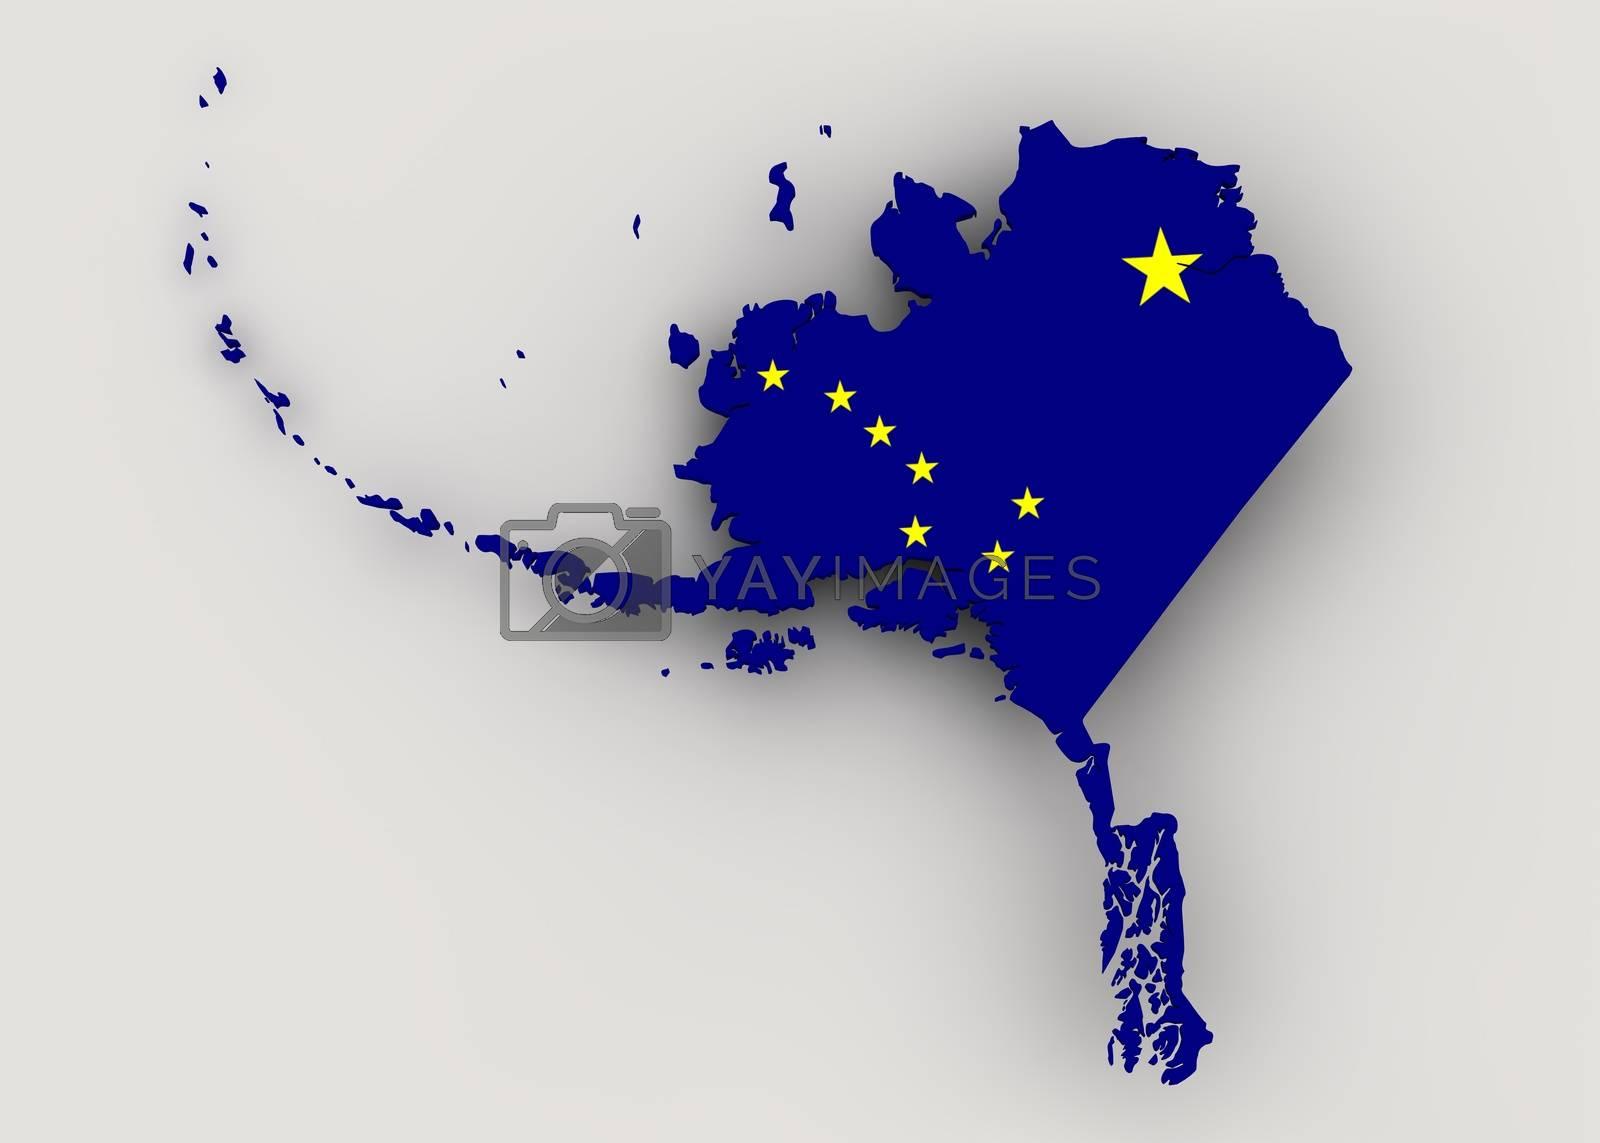 Royalty free image of Alaska by 3DAgentur